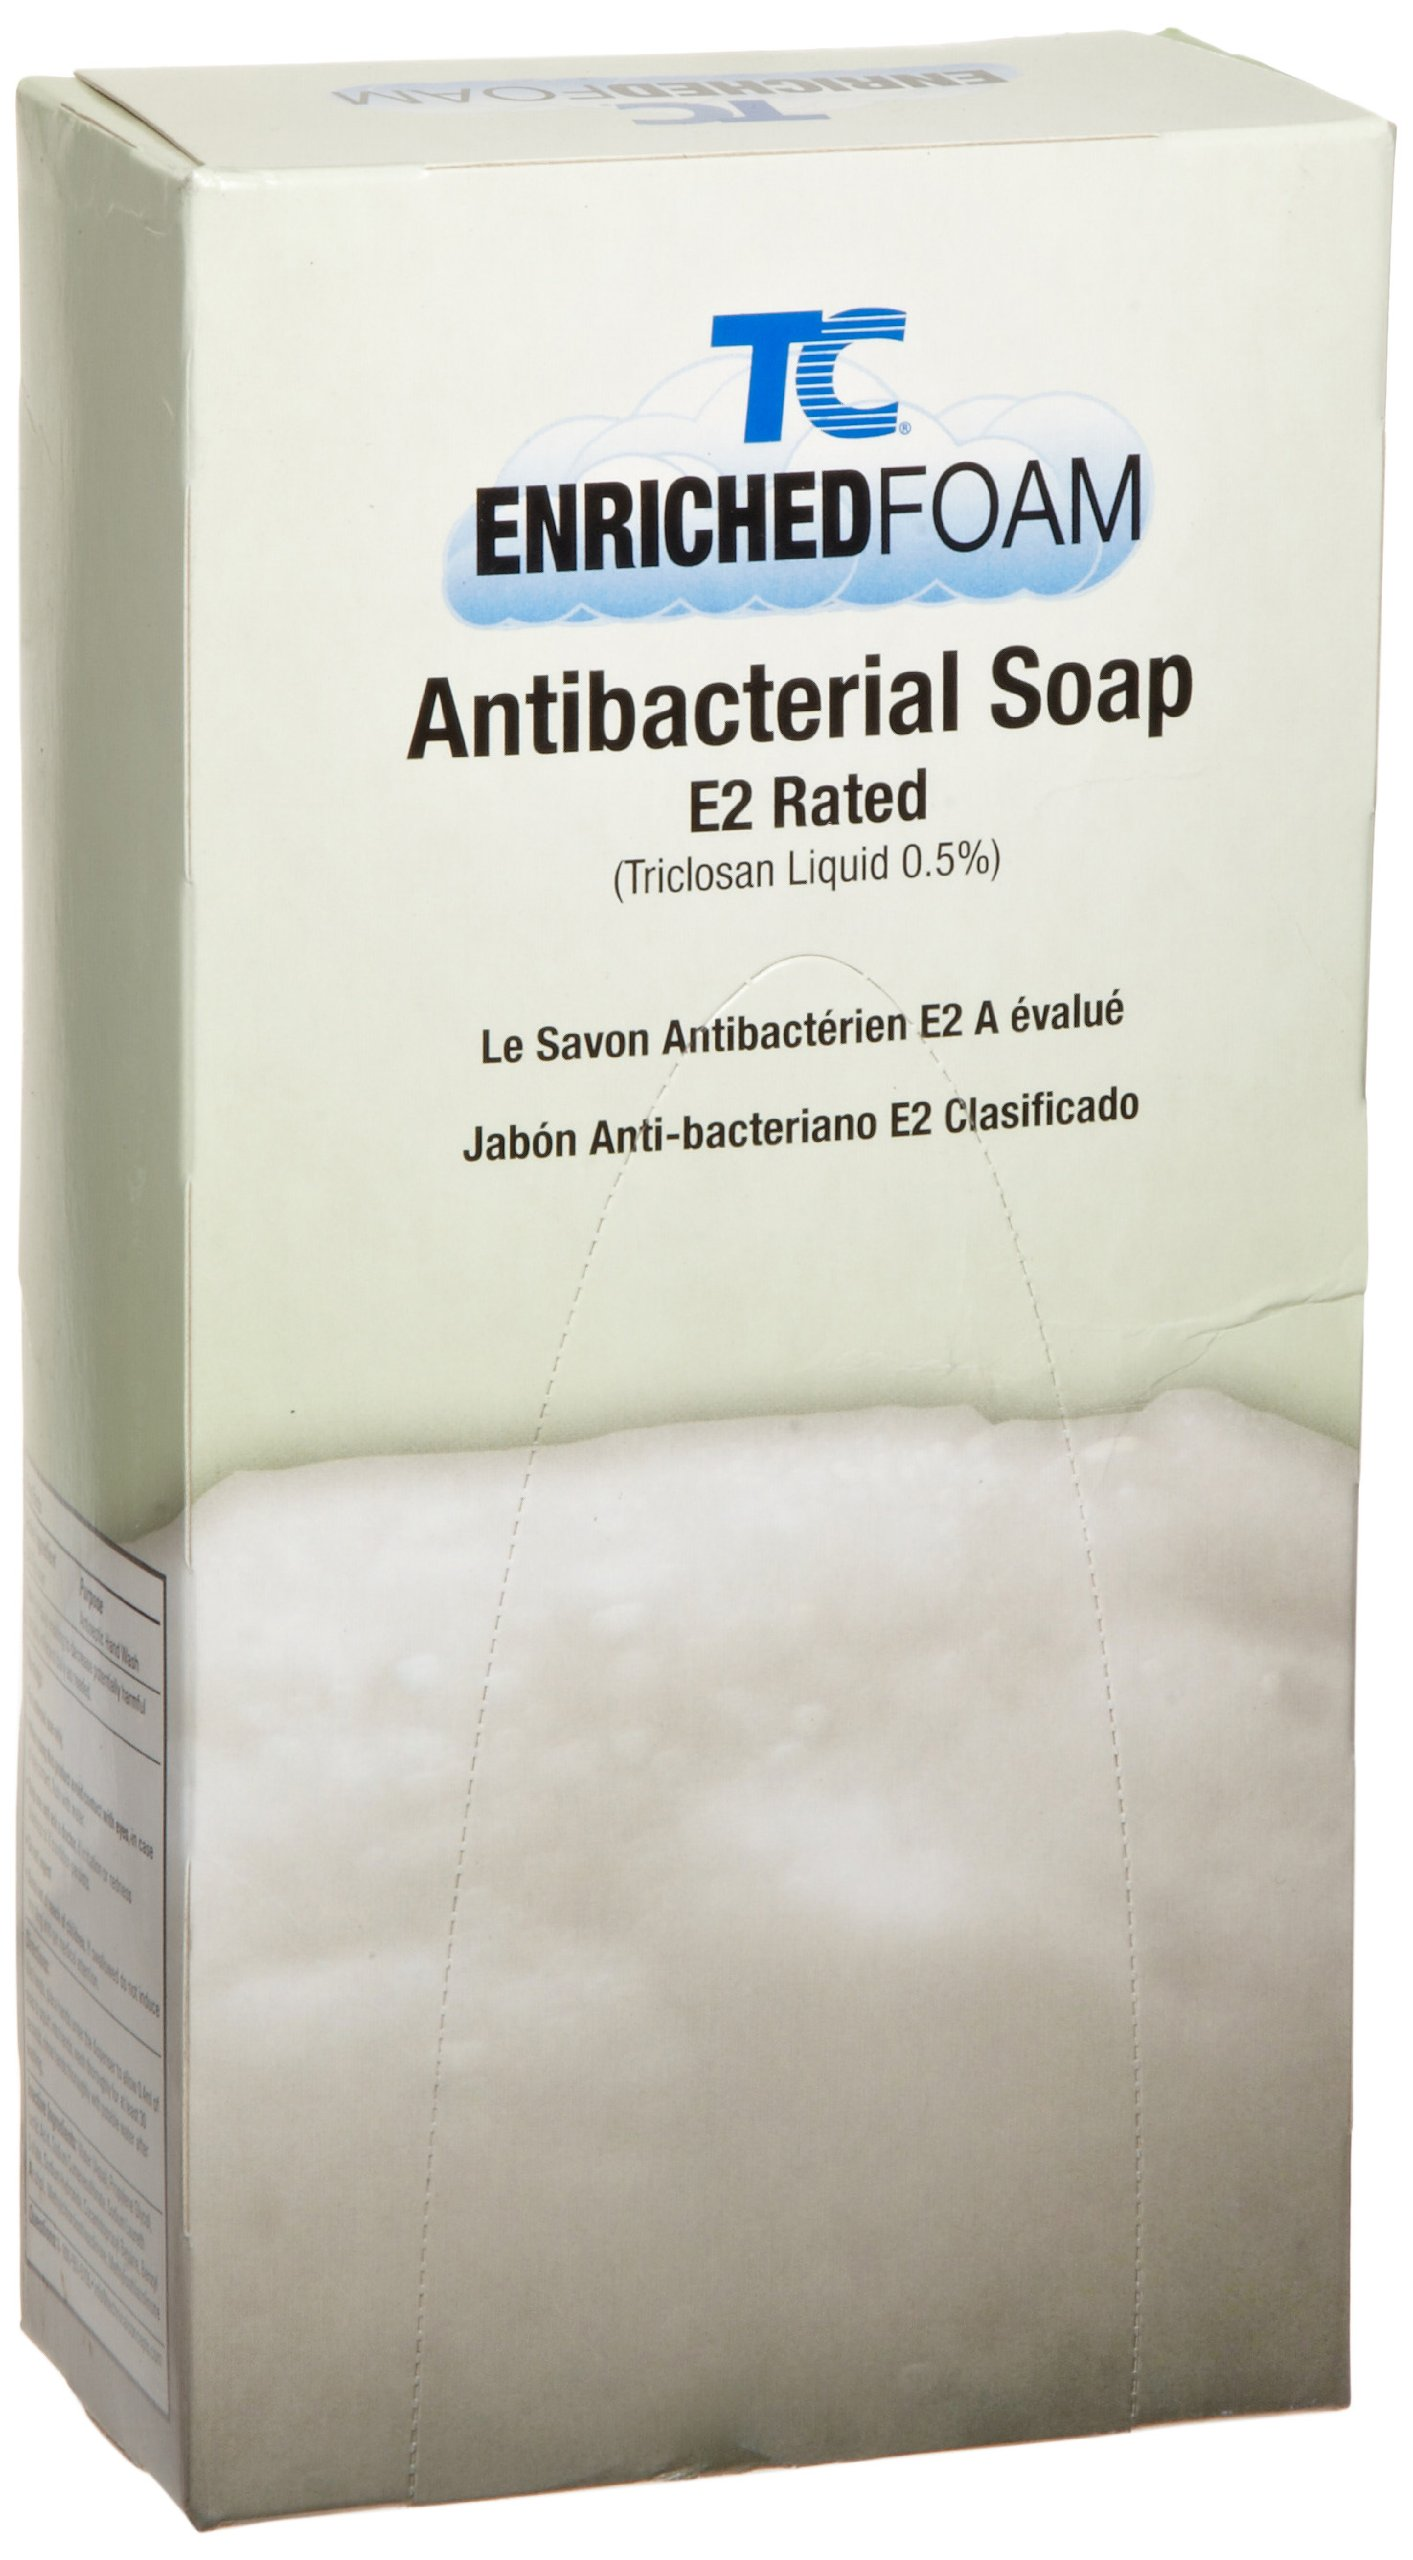 Rubbermaid Commercial Enriched Foam Antibacterial Soap E-2, 800-ml, FG450031